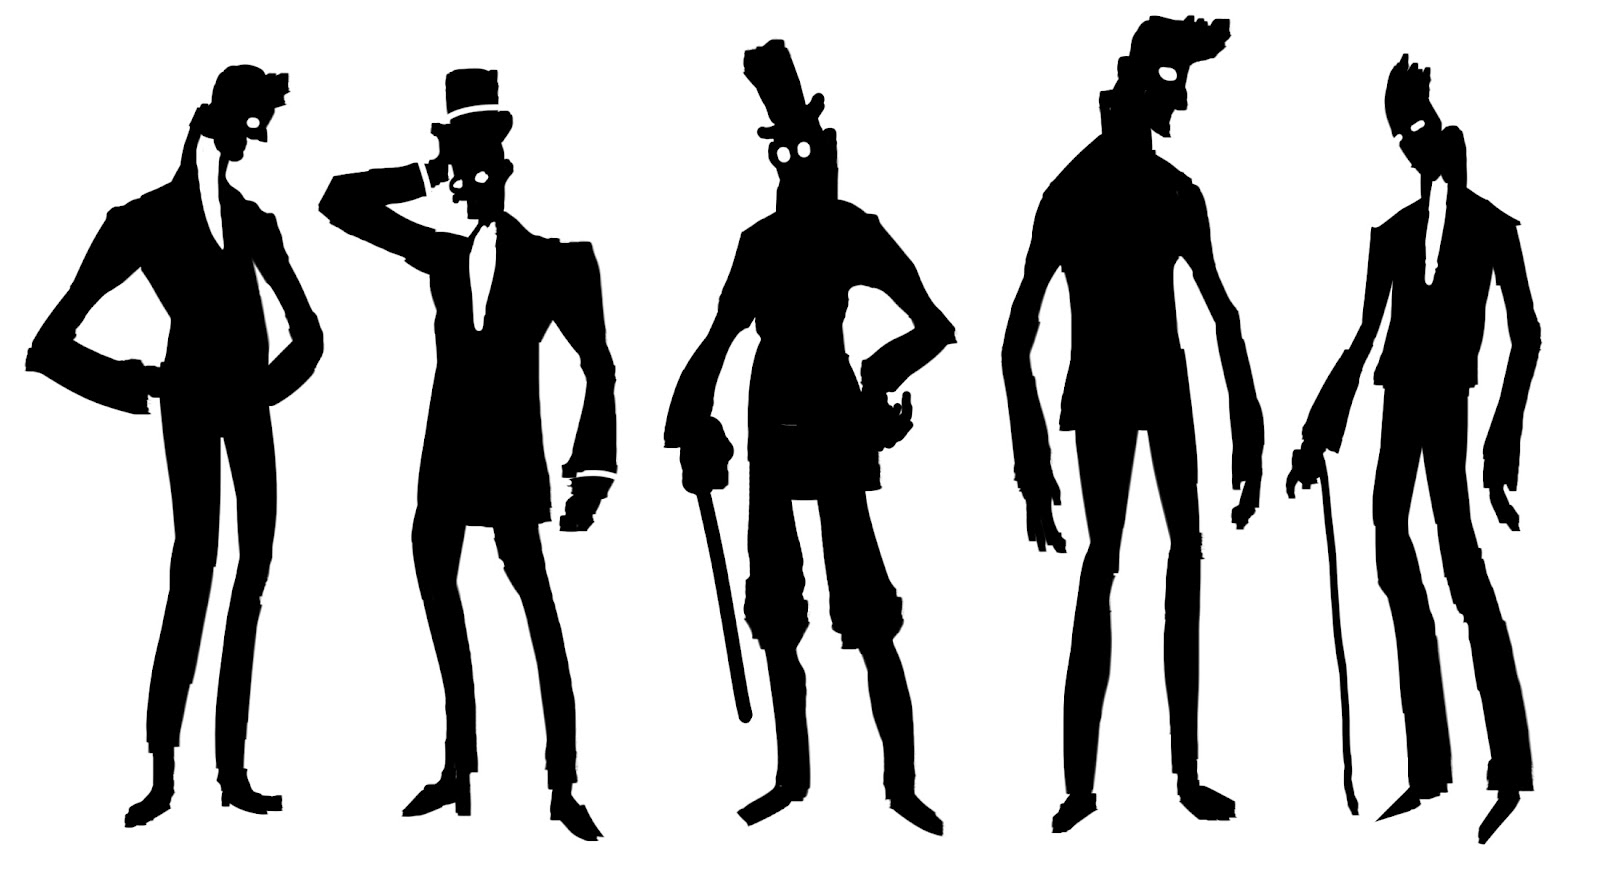 S Gangster Silhouette At Getdrawings